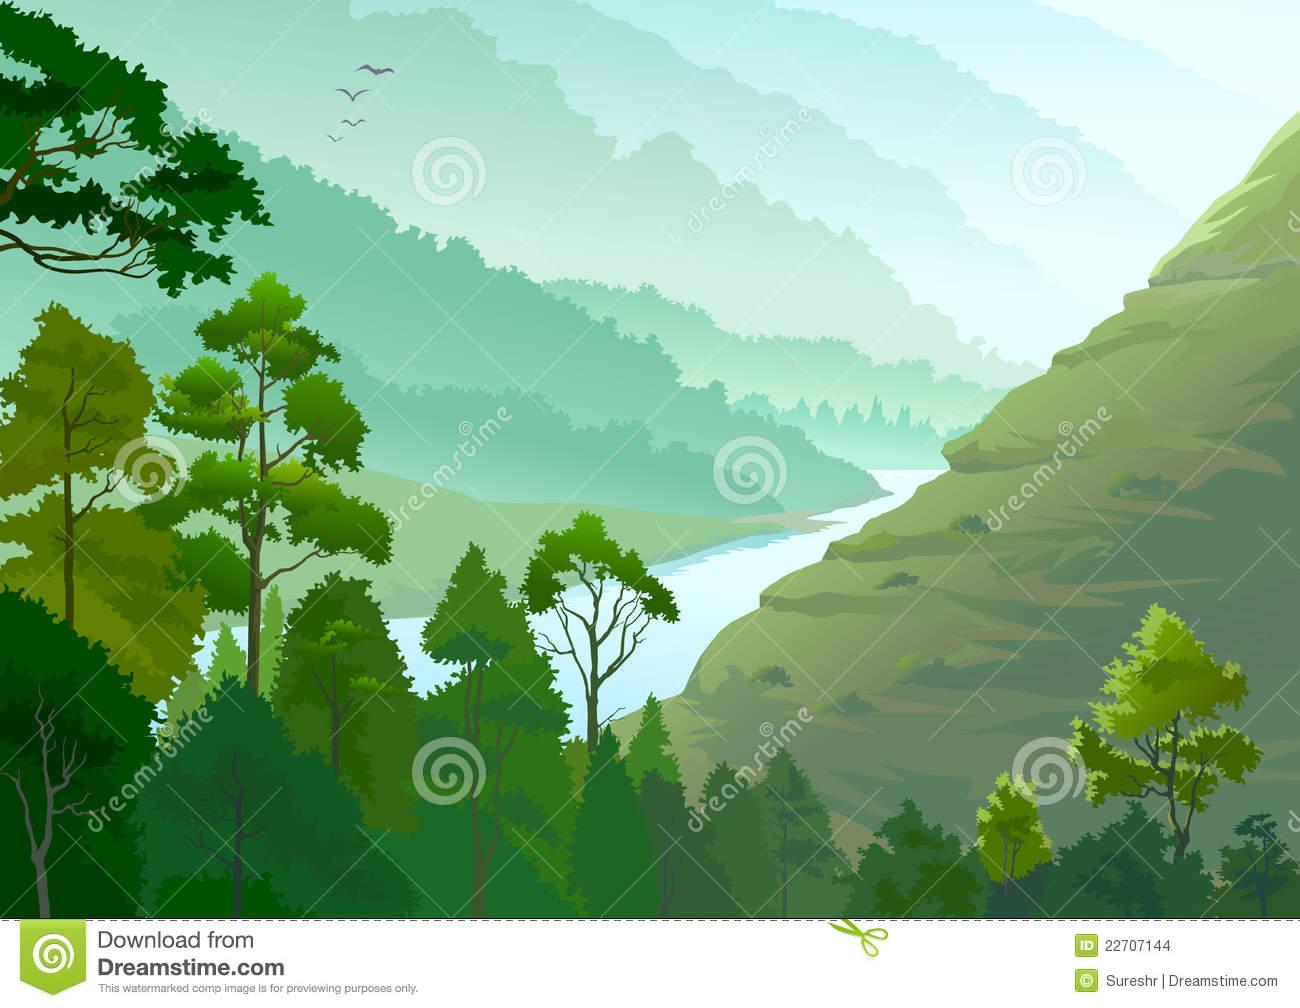 River Flowing through Amazon  - Amazon Clipart